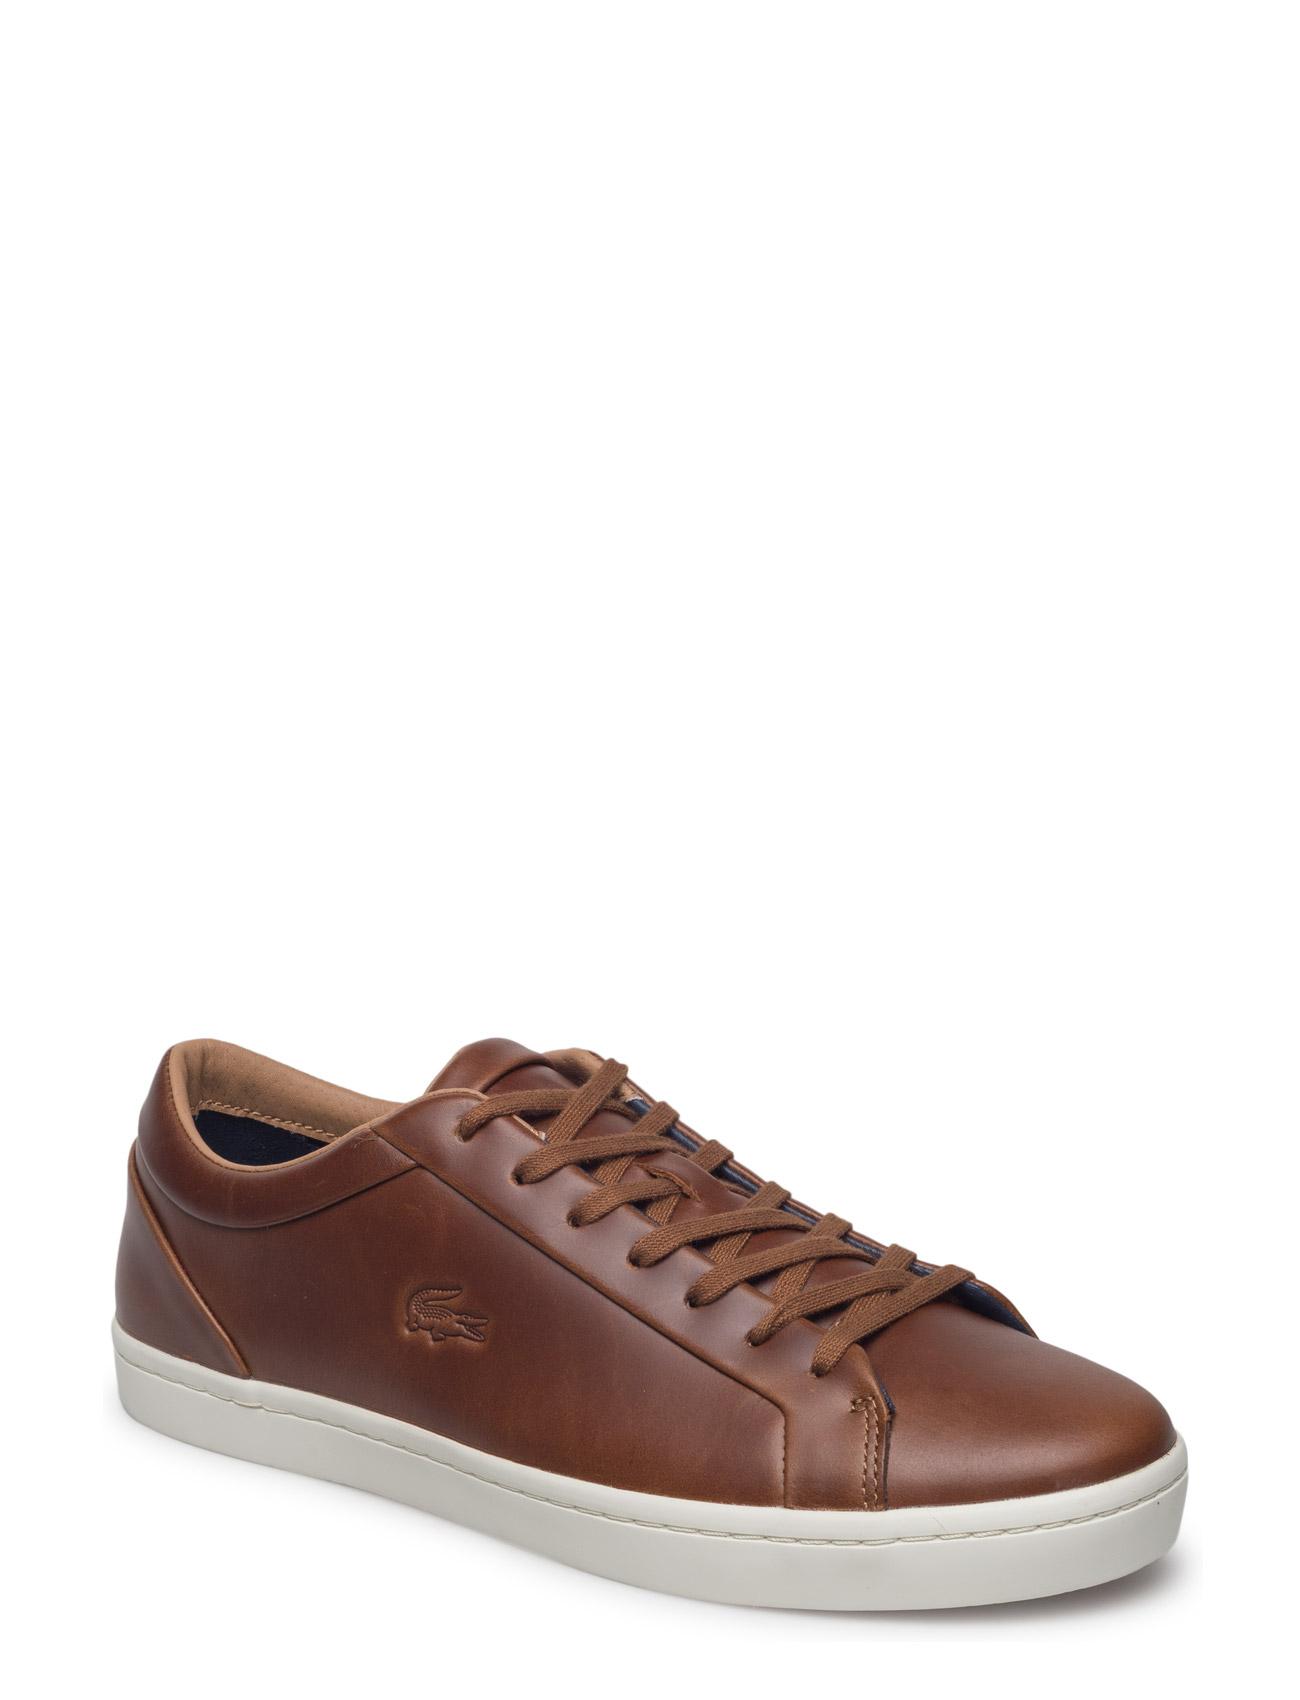 lacoste shoes Straightset 317 1 på boozt.com dk